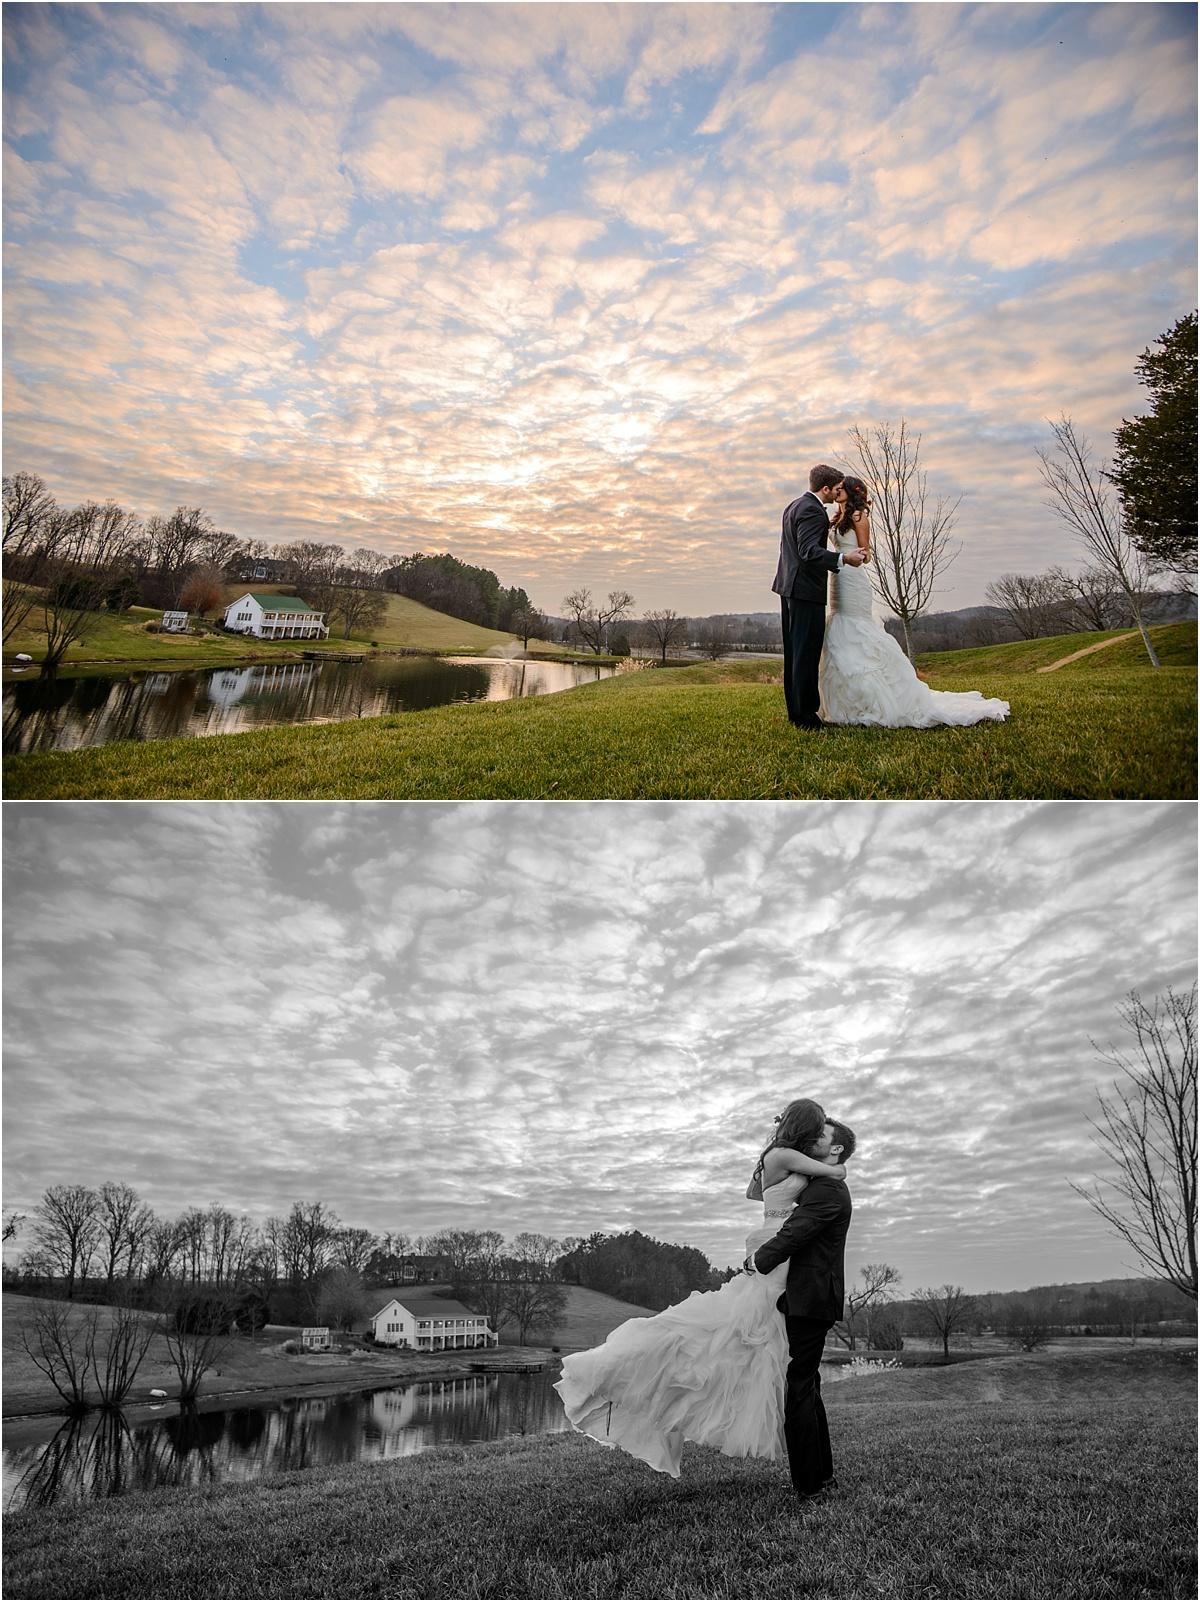 Greg Smit Photography Nashville wedding photographer Mint Springs Farm_0018